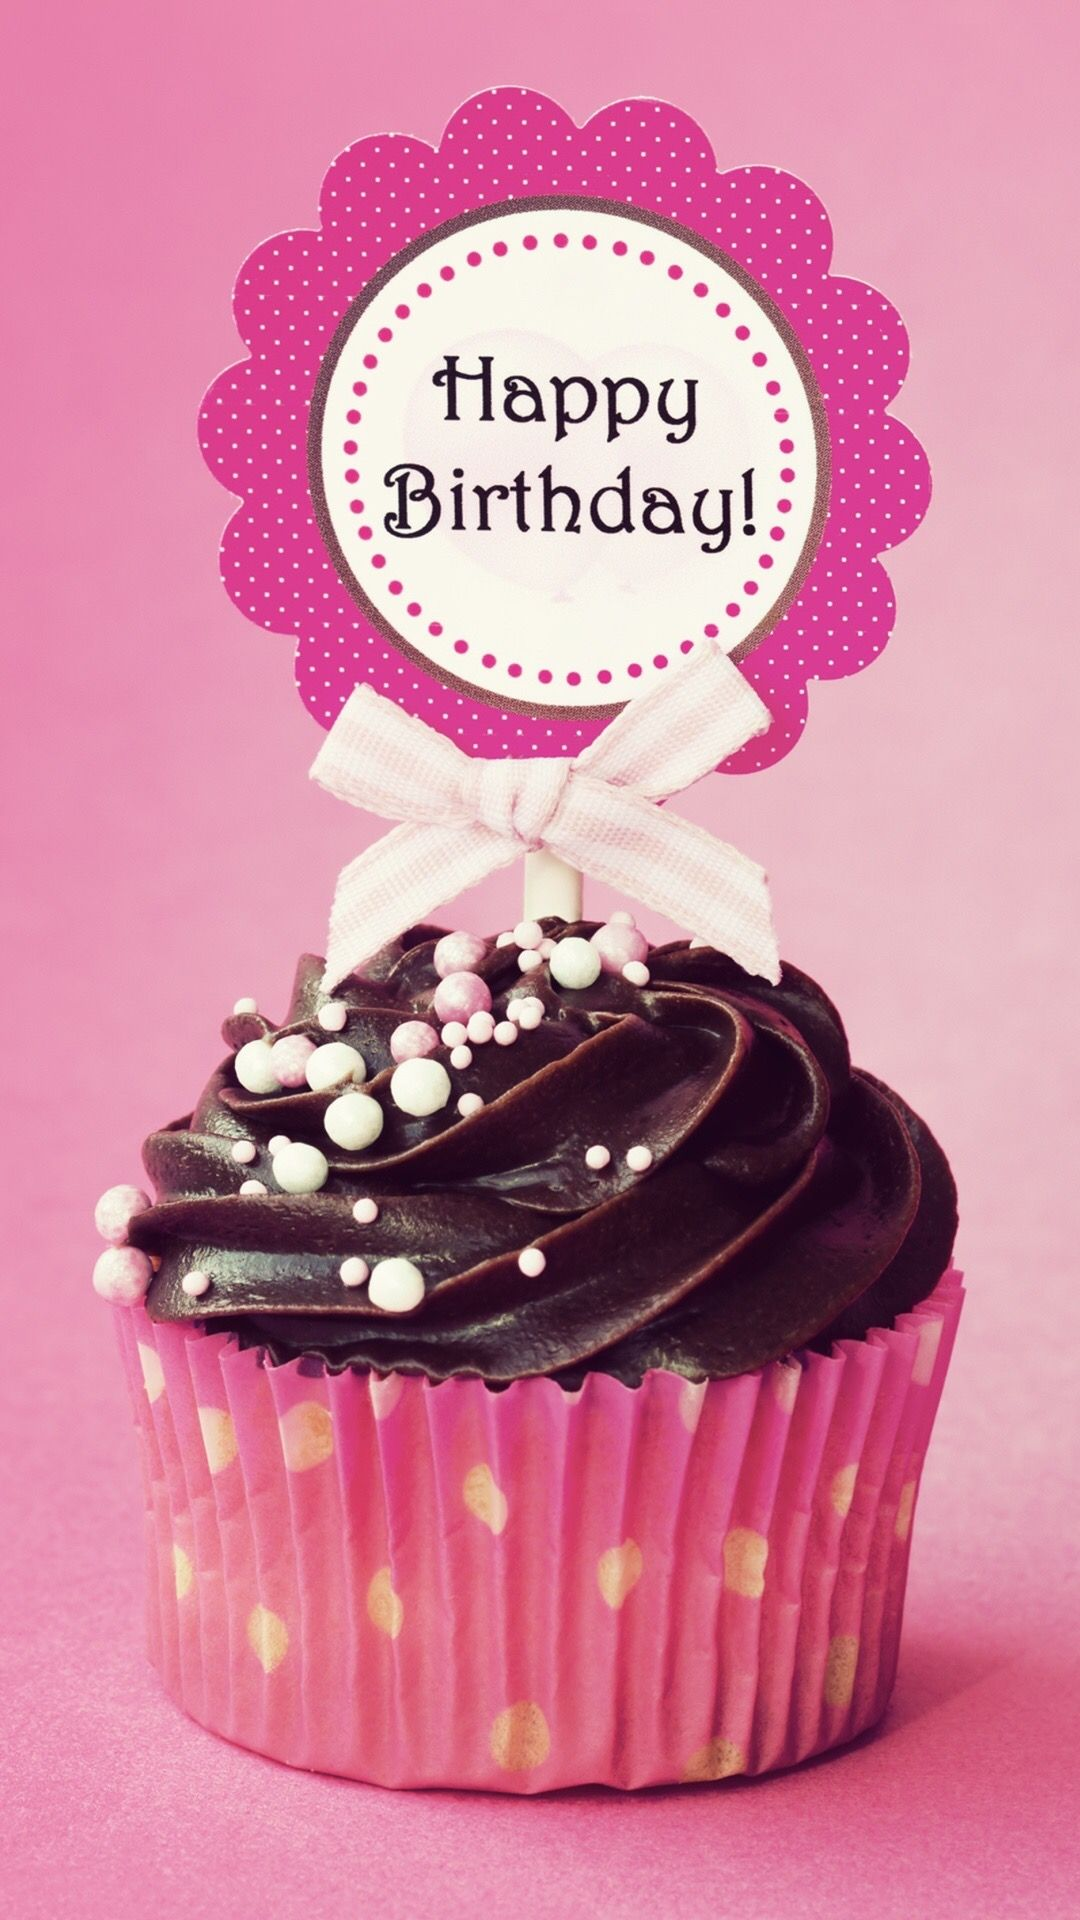 Pin by Dhada Bernabe on Birthday greetings Happy